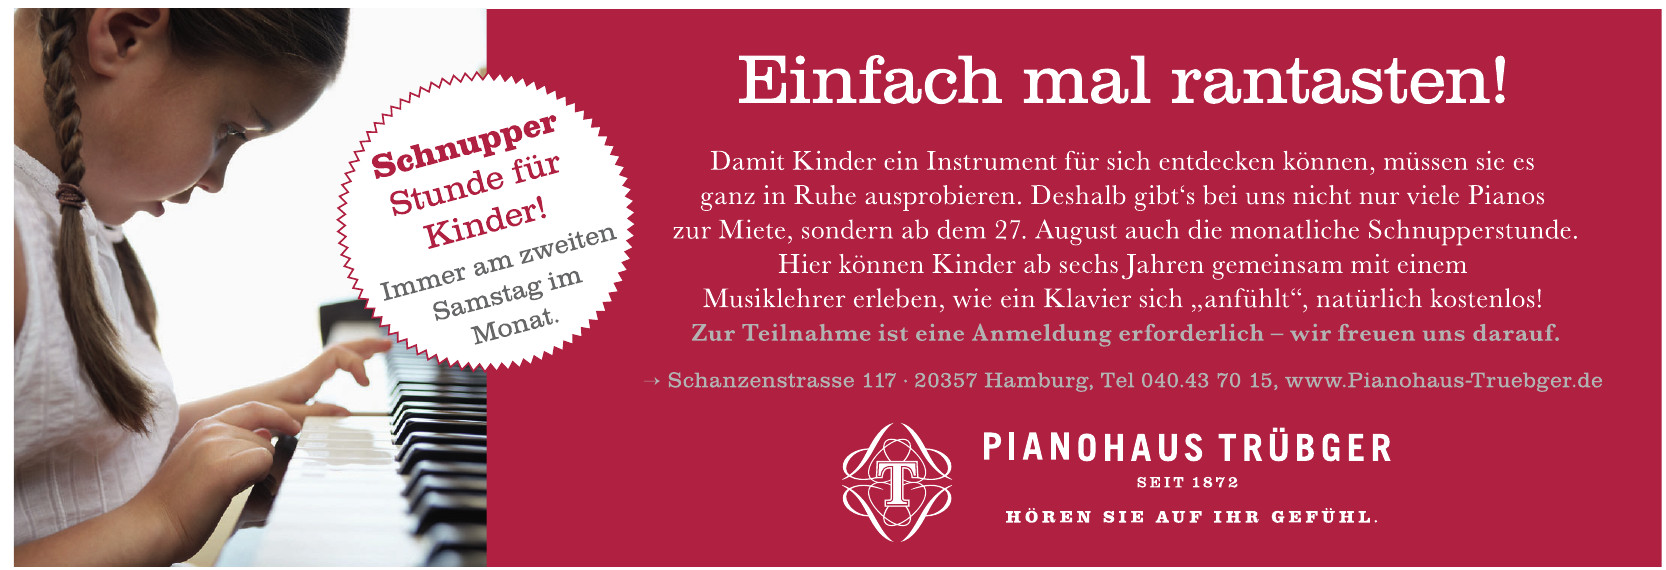 Pianohaus Trübger - Klaviere und Flügel